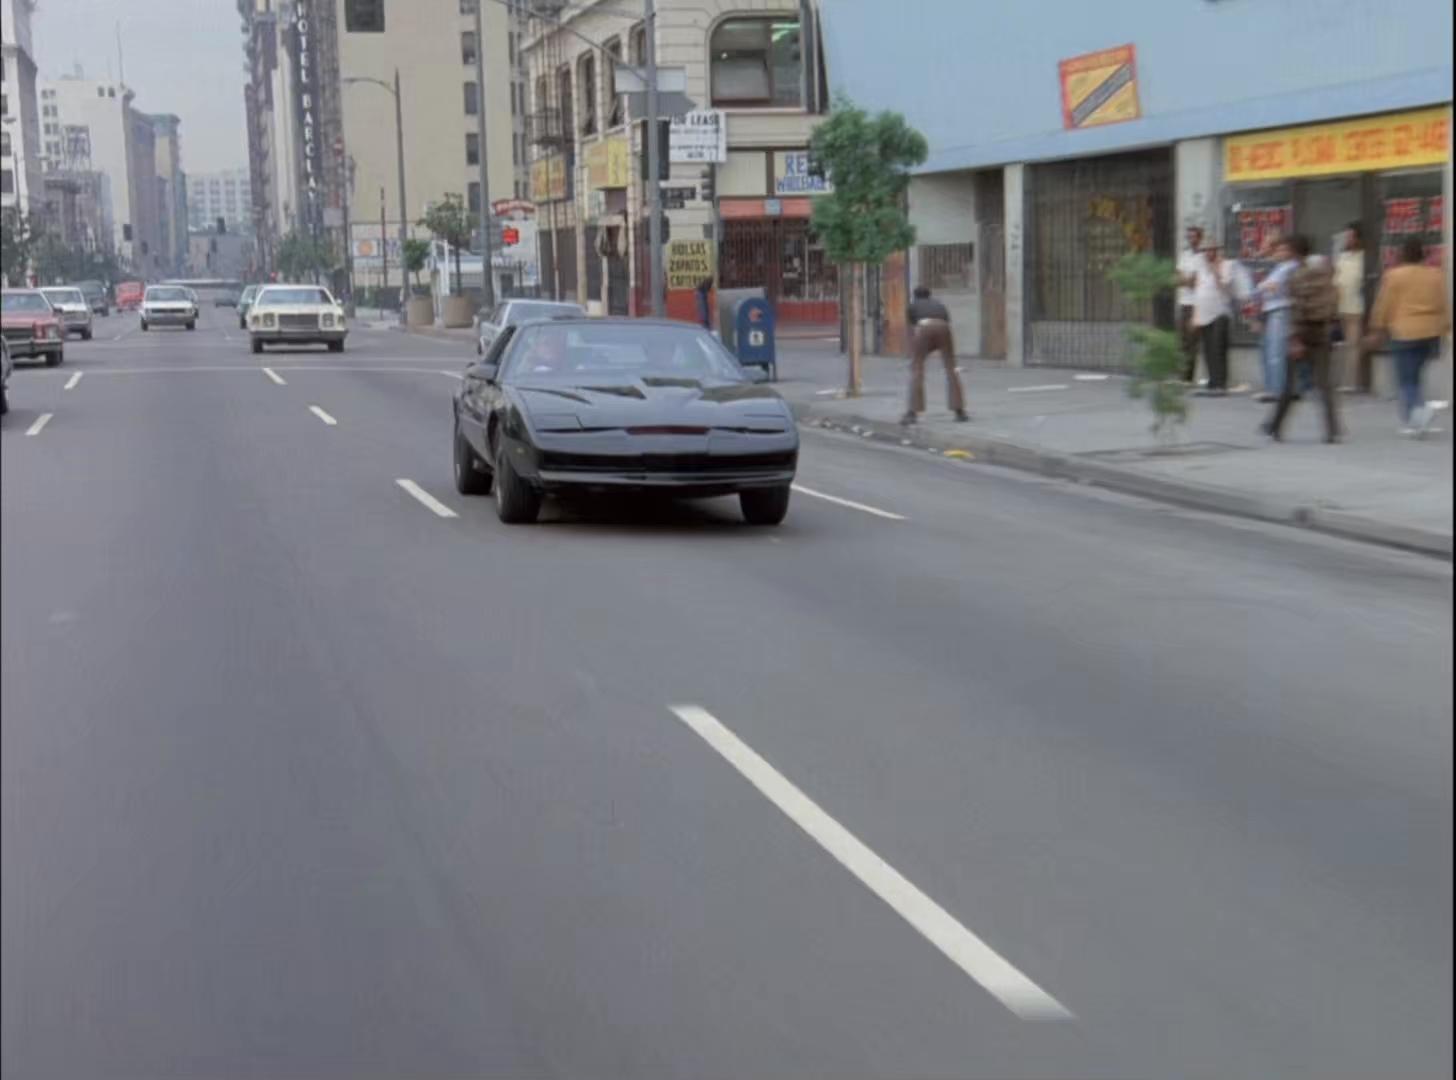 Knight.Rider.S01E06.BluRay.1080p.AC3.H265-d3g.mkv_snapshot_43.33.611.jpg